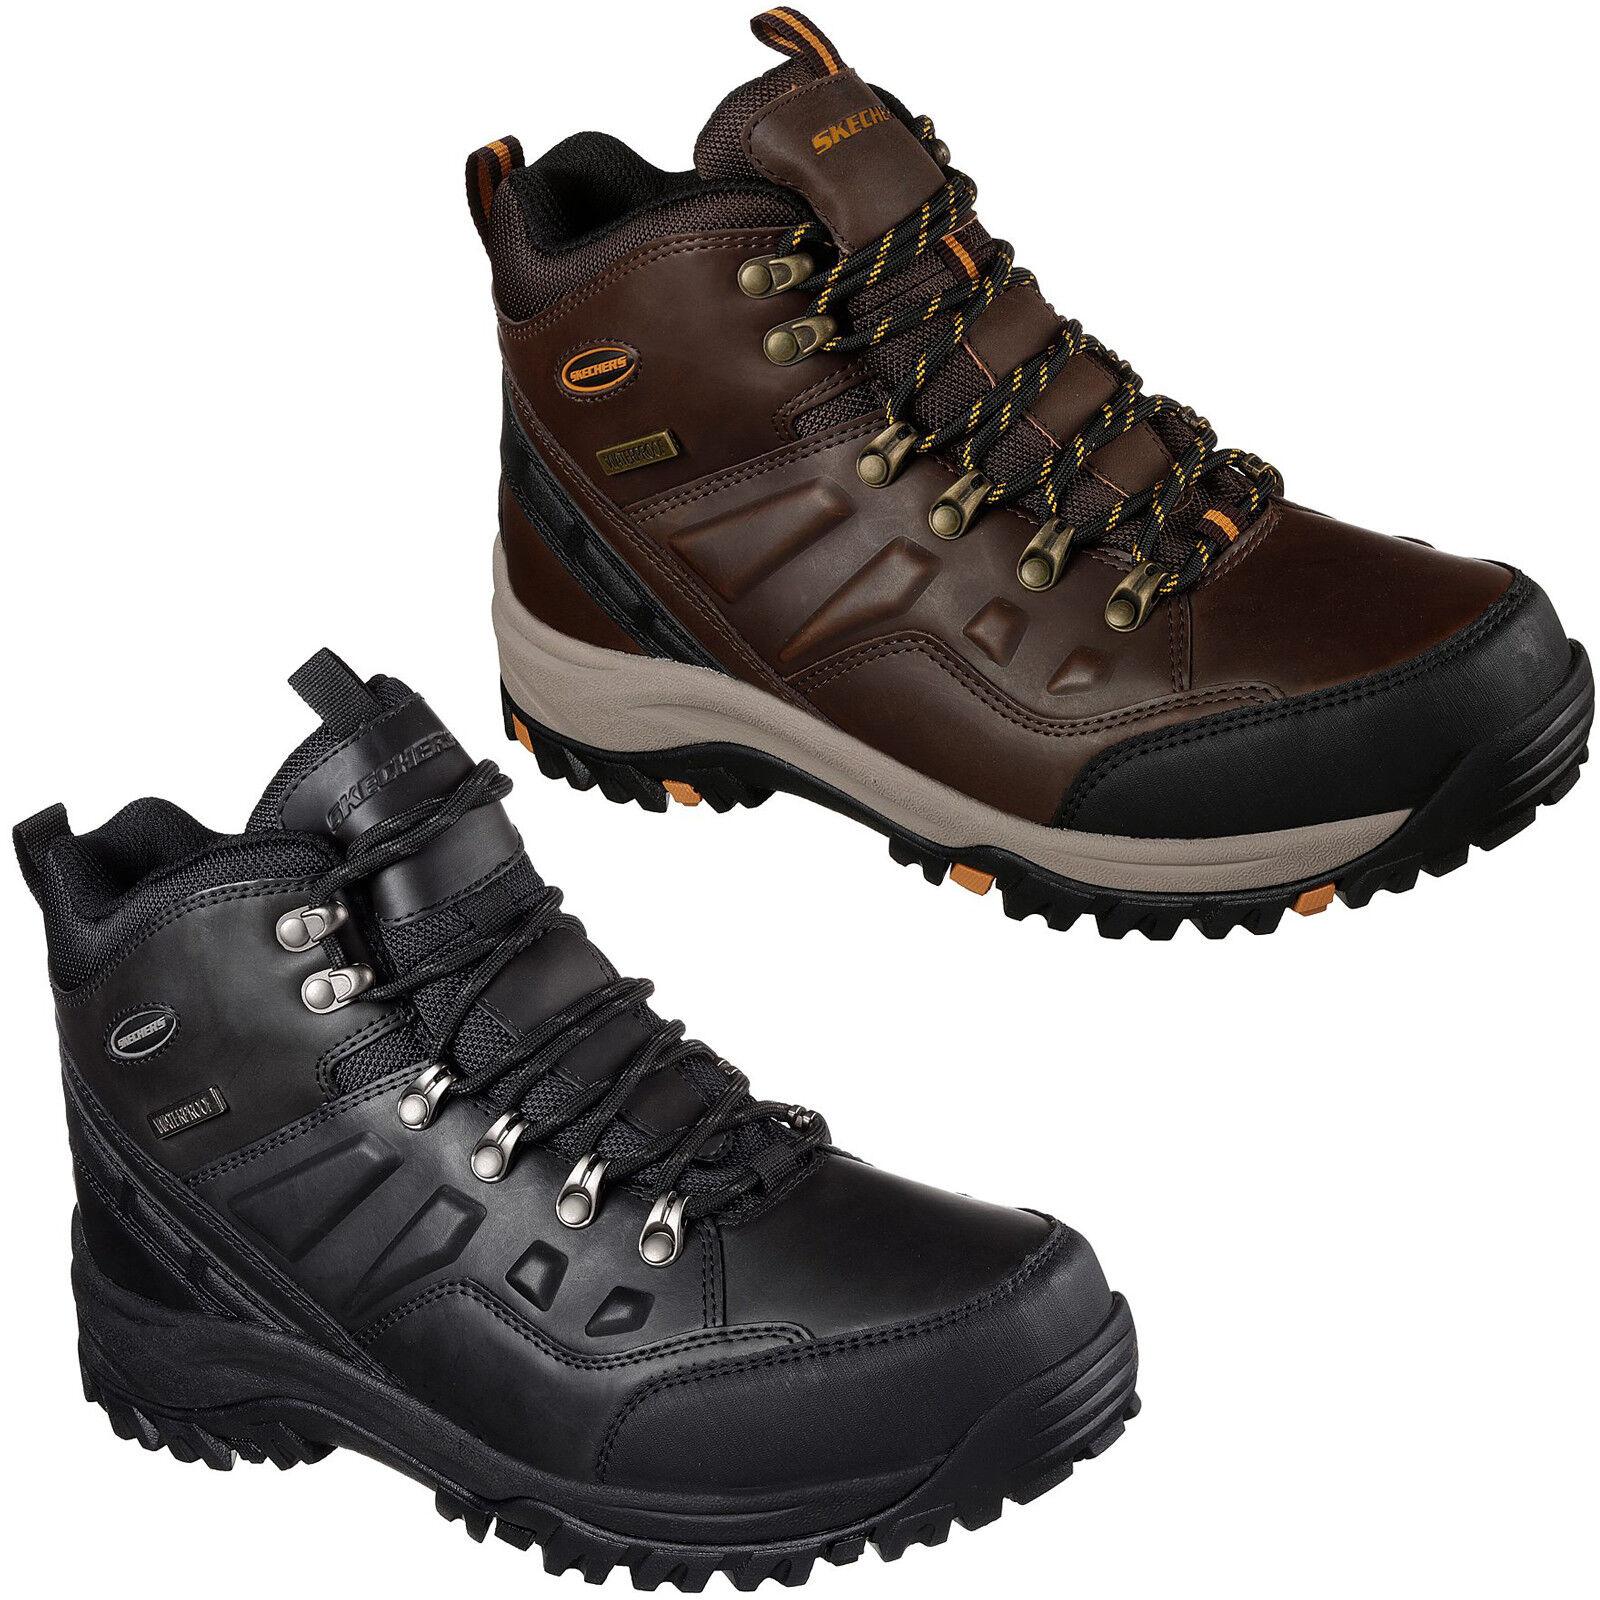 Skechers Relaxed Fit: relment-TRAVEN Trail Stivali MEMORY FOAM robusto Trail relment-TRAVEN da uomo 65529 d21872